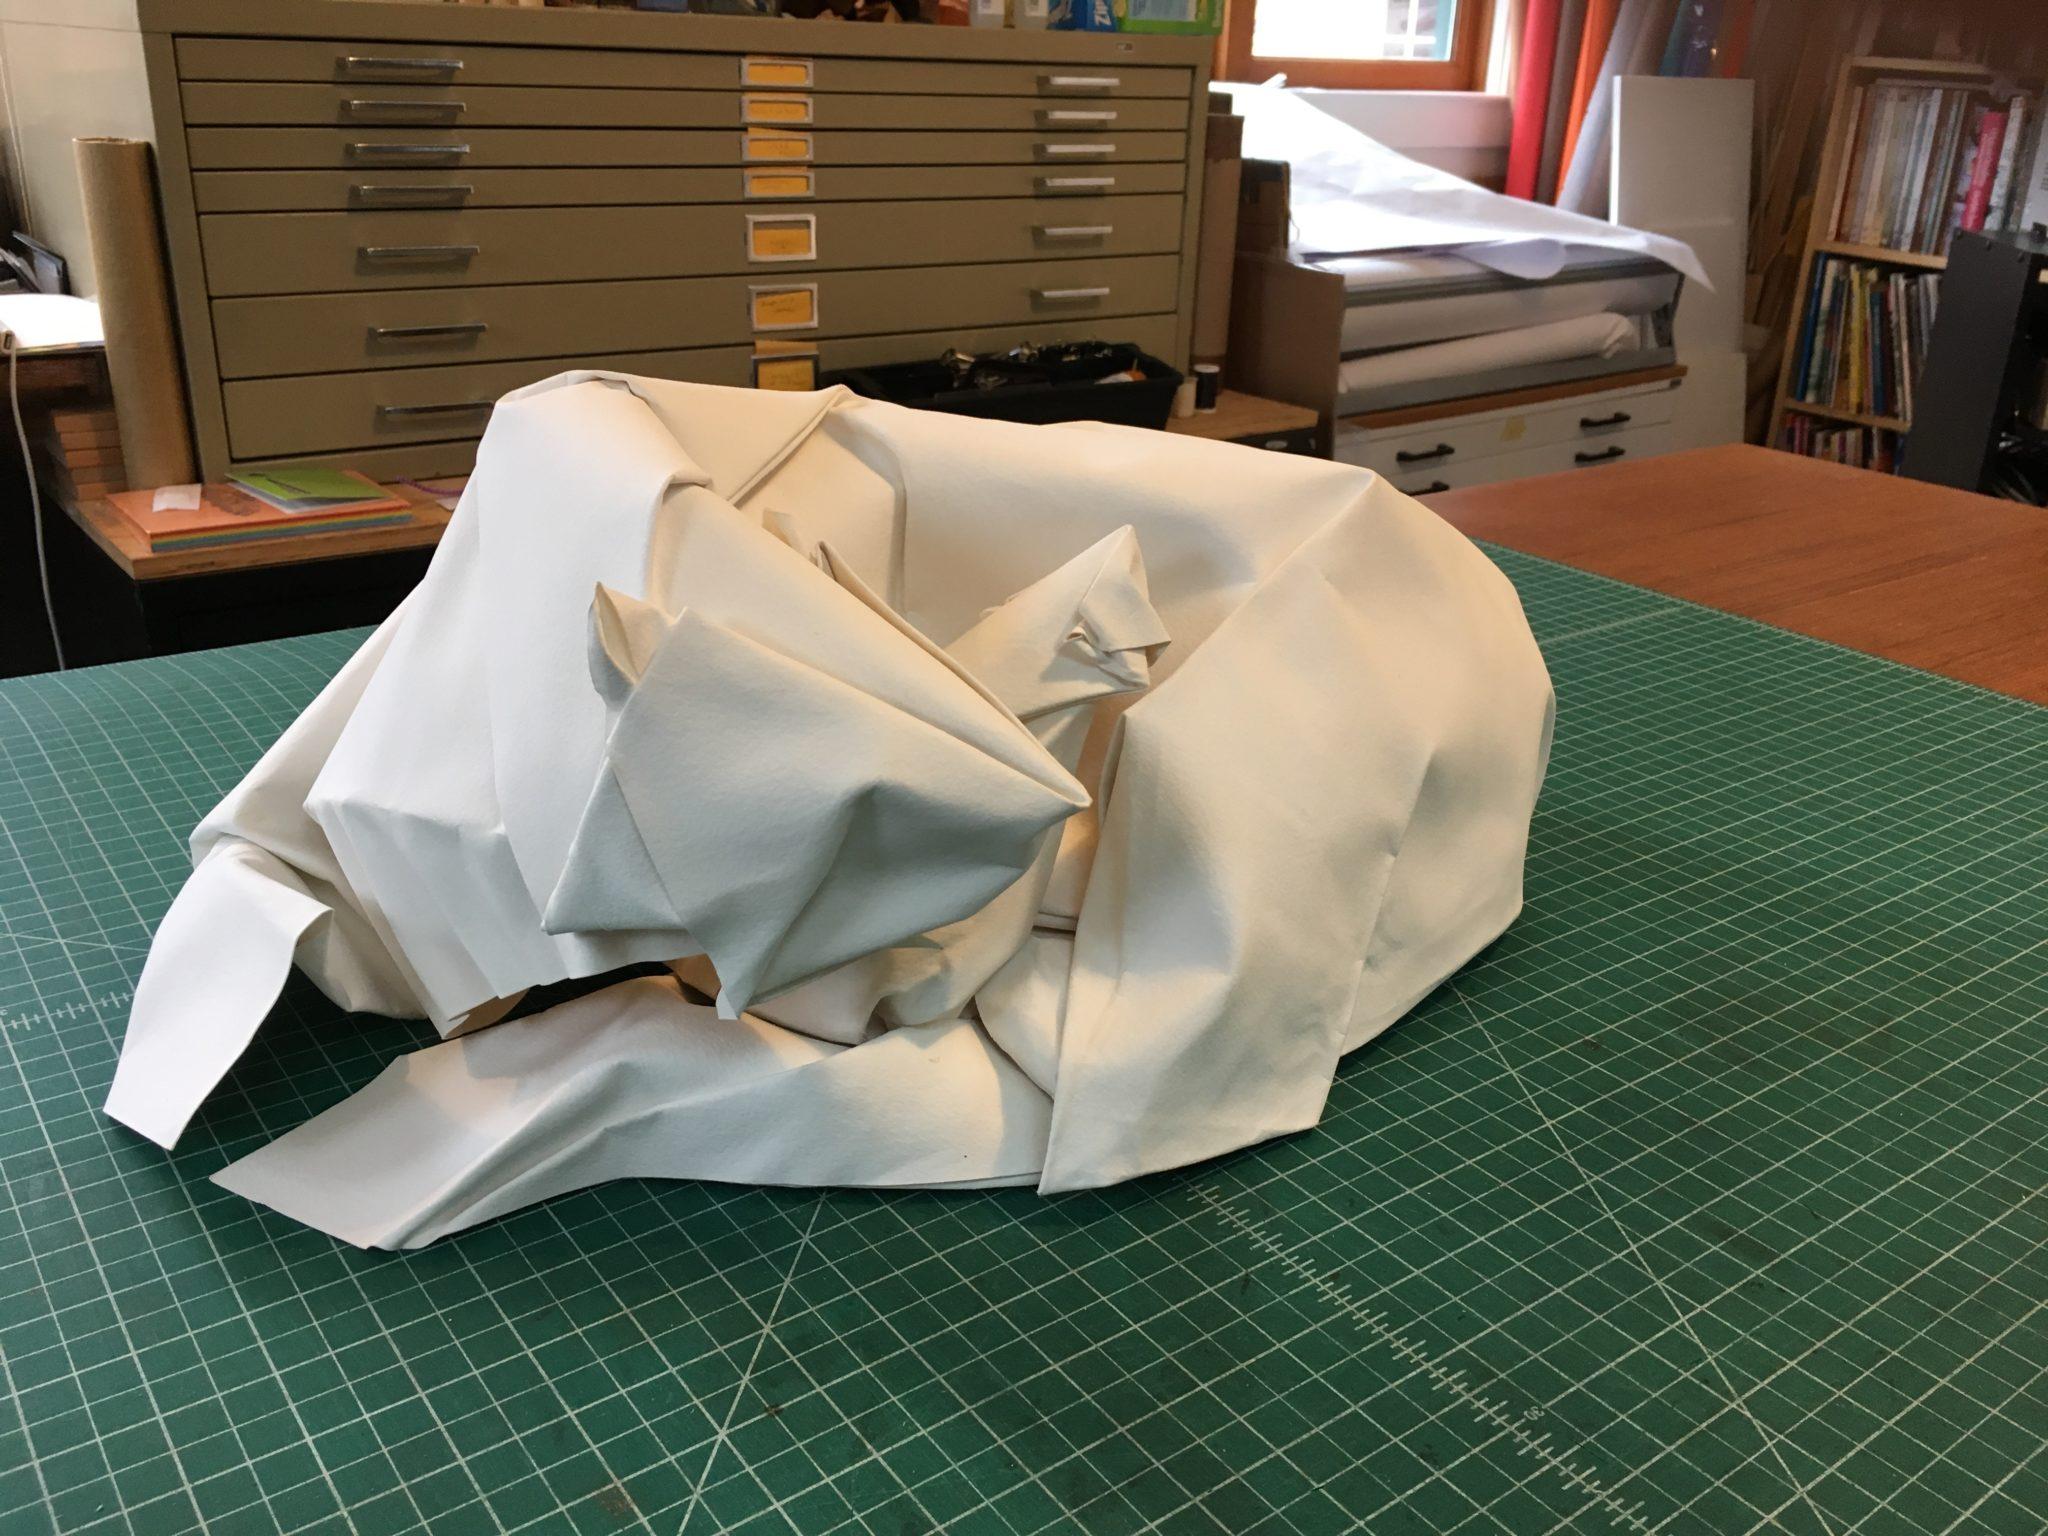 Origani Bed   Bed origami, Origami easy, Diy barbie furniture   1536x2048